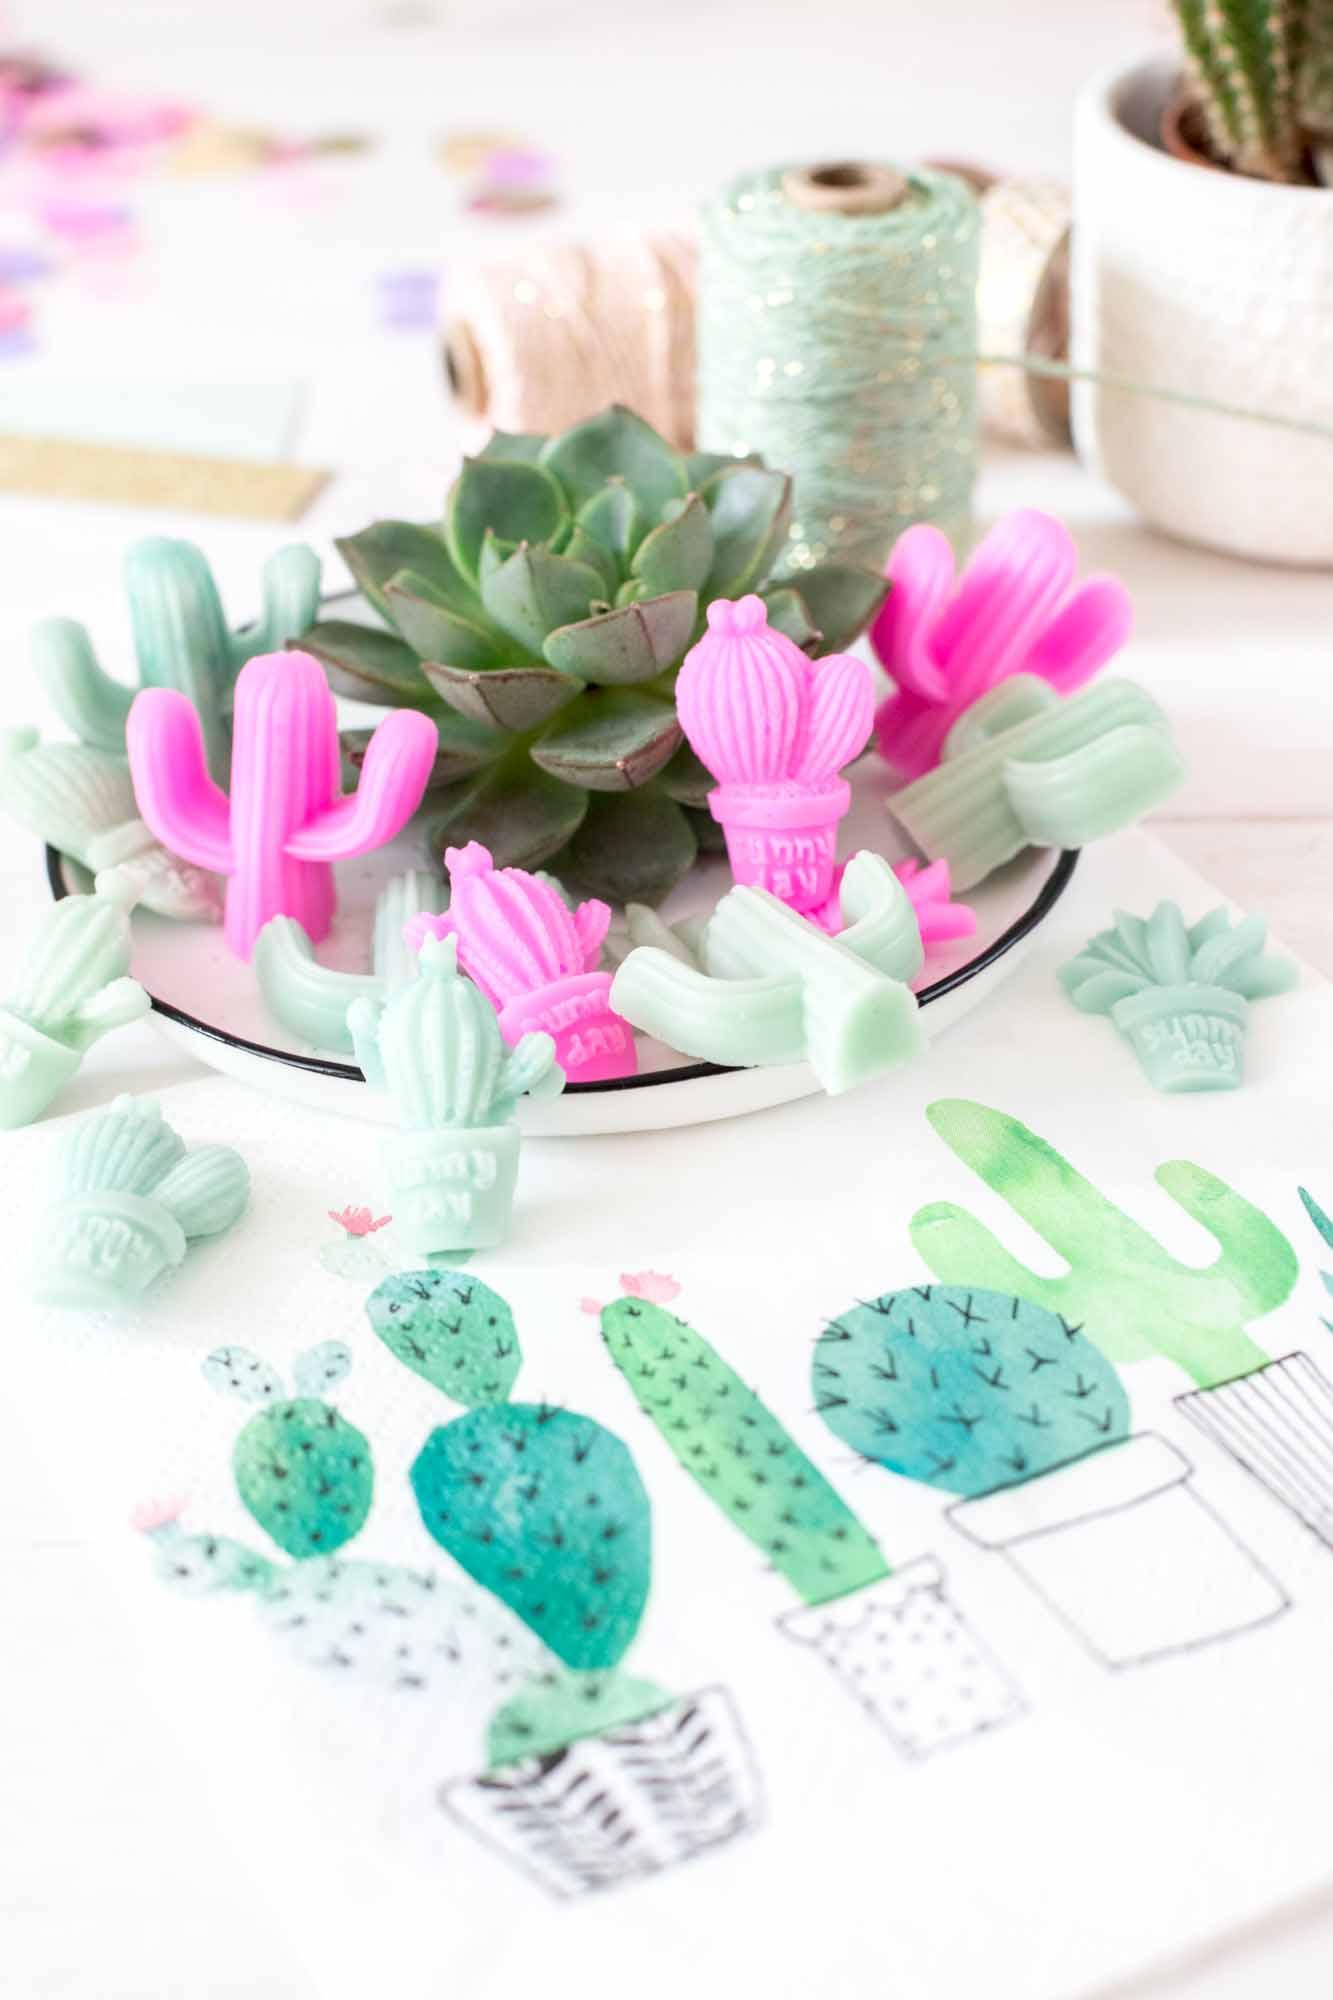 kaktus-seife-selber-gießen-kaktus-diy-12